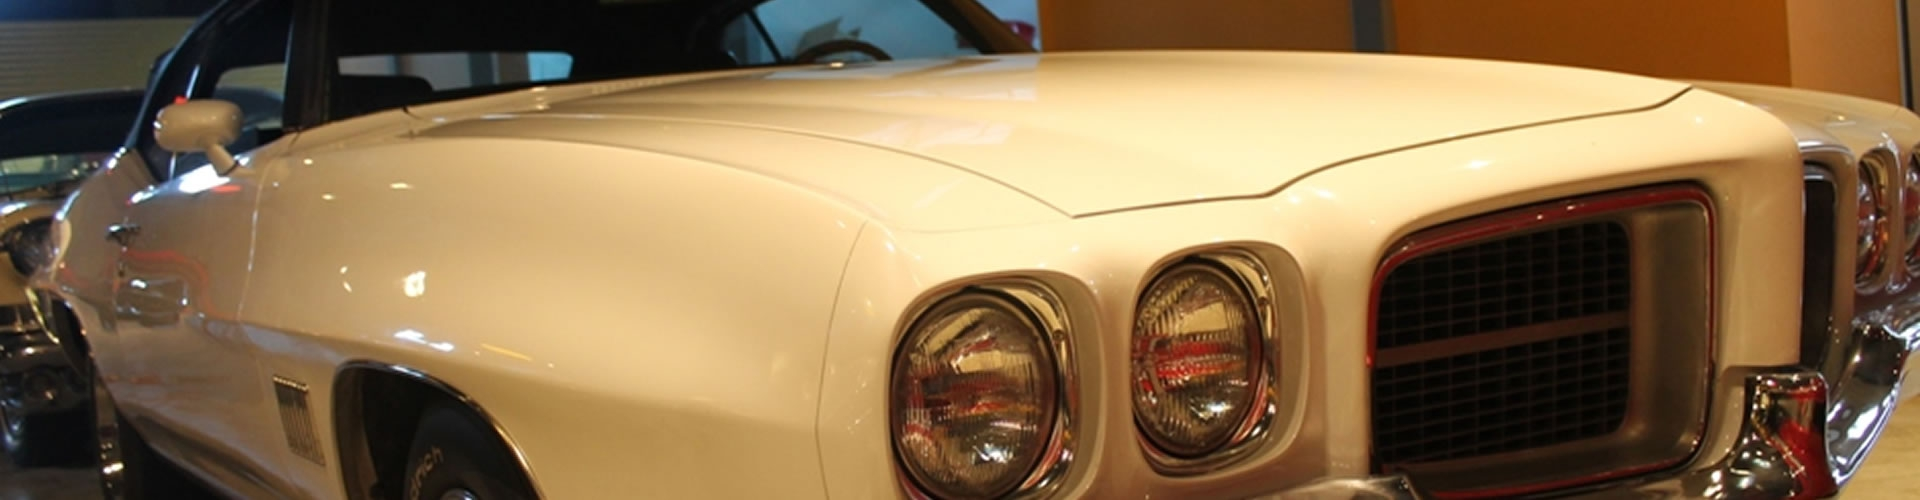 1971 Pontiac Lemans Convertible